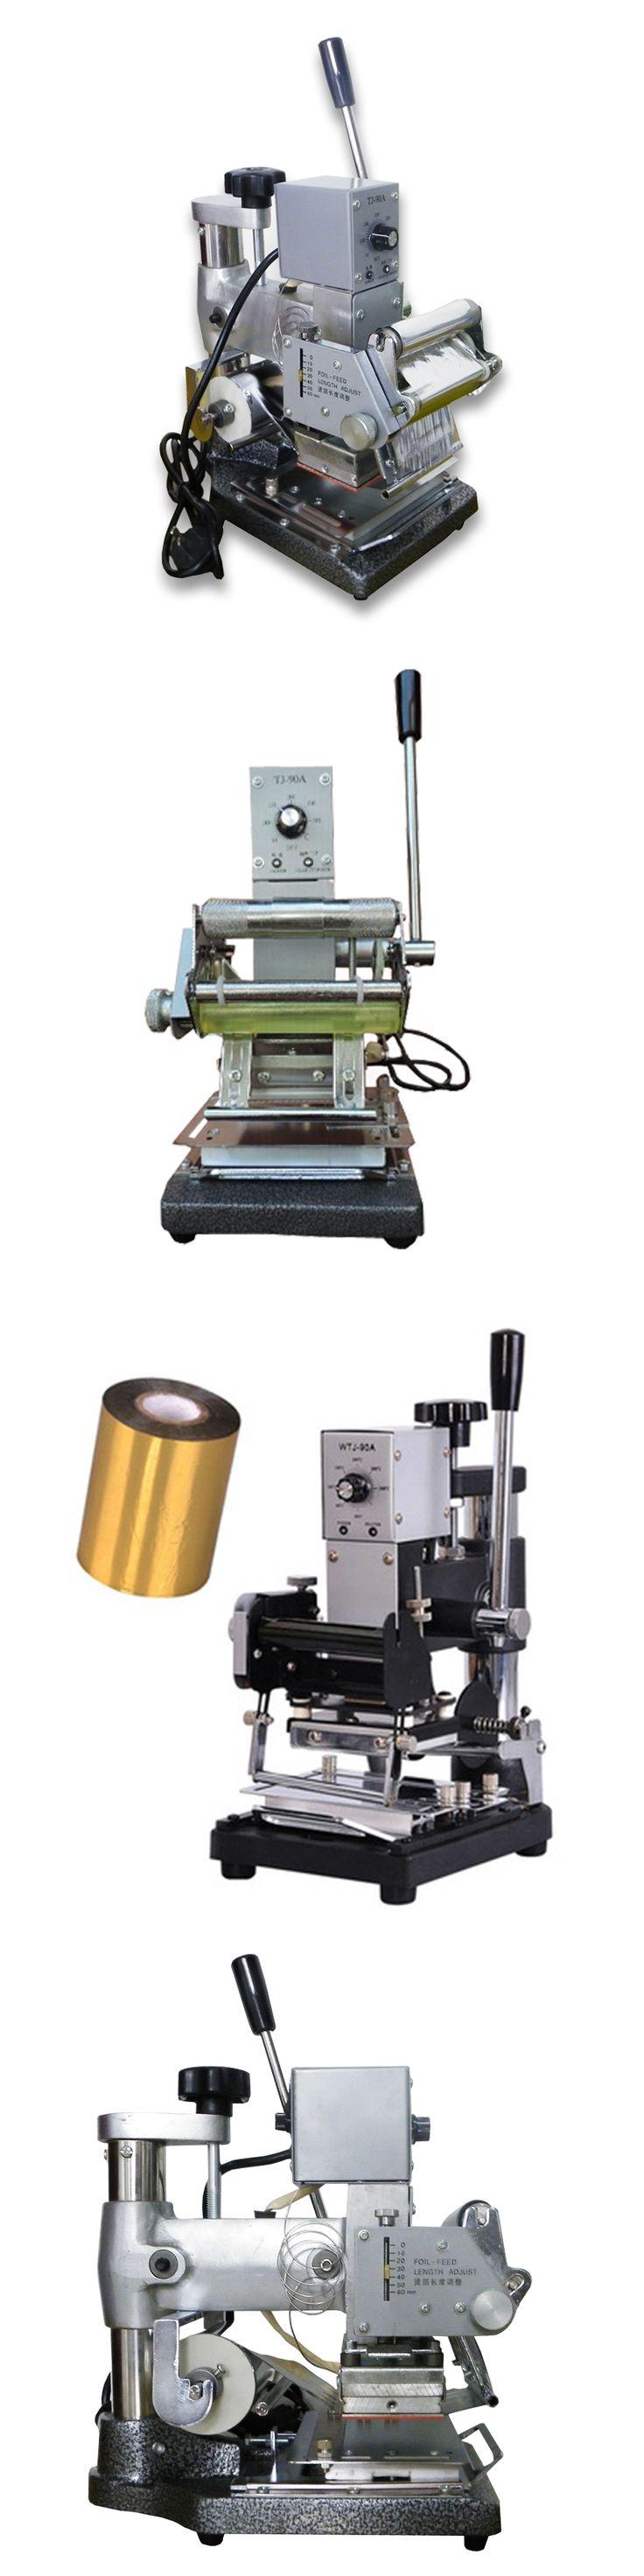 Hot Gilding Press Machine For PVC ID Credit Card Club Hot Foil Stamping Bronzing Machine on High quality